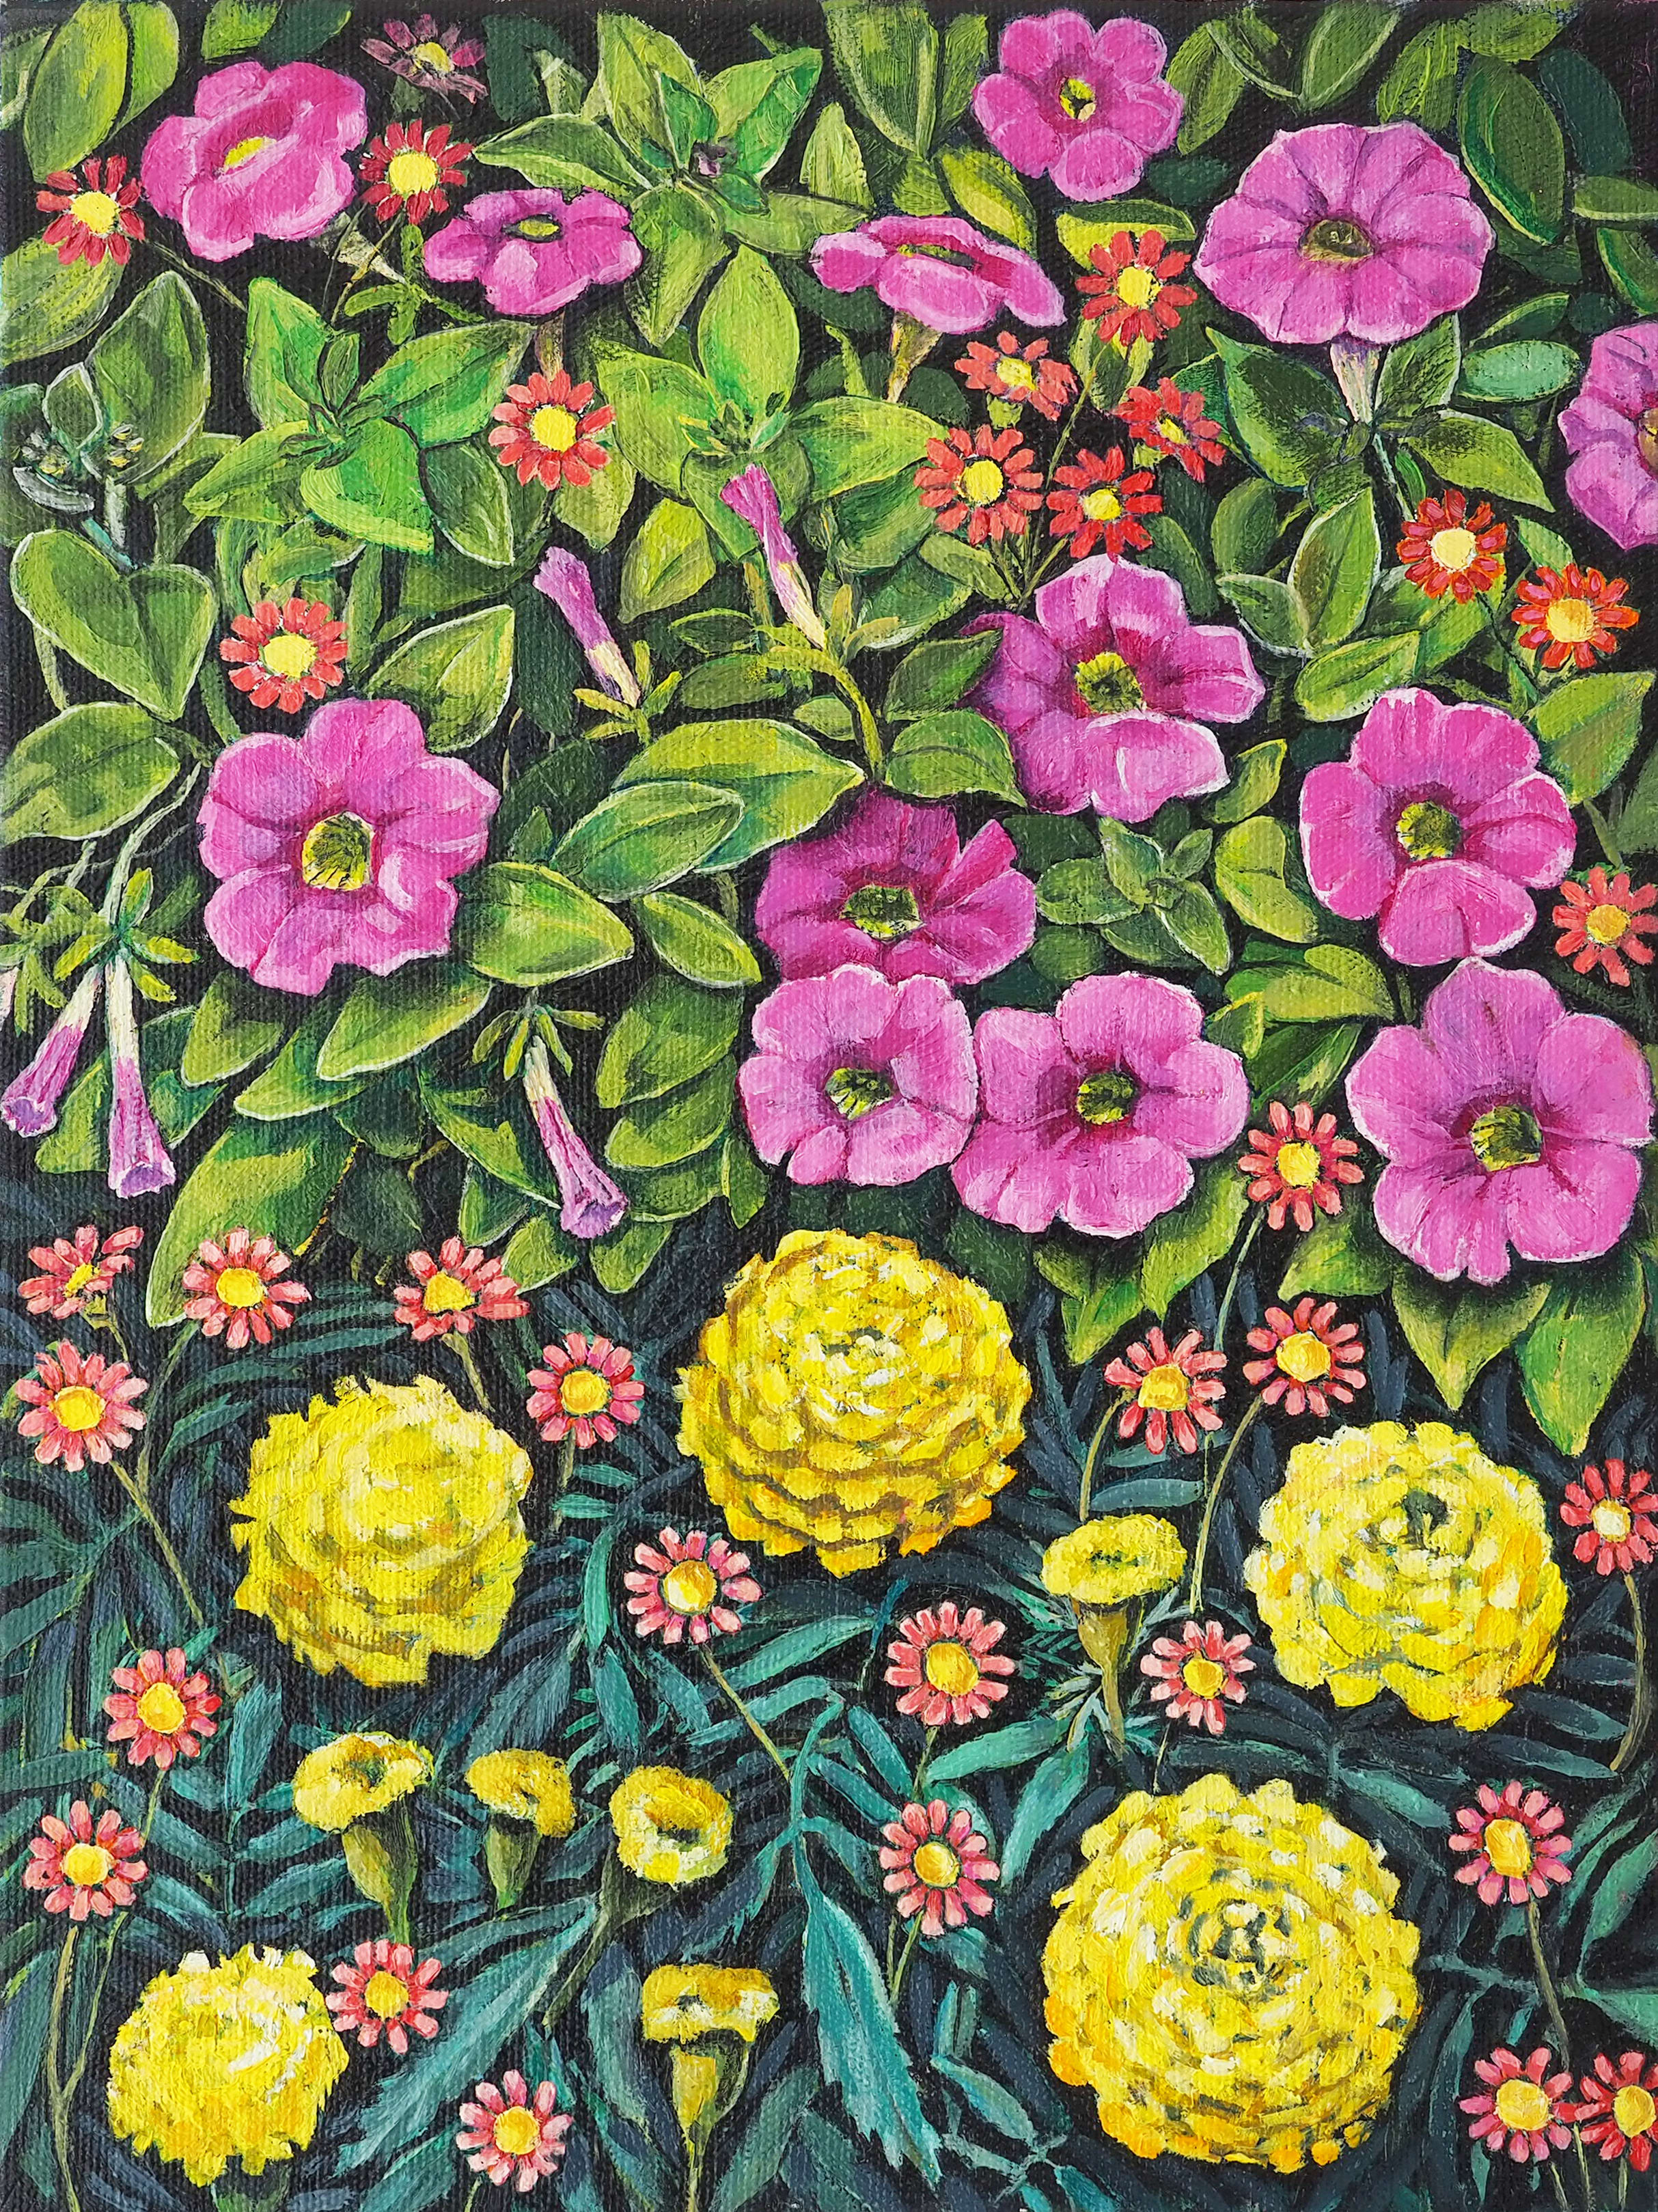 Petunias 'n' Pompom Marigolds 30x40cm oil on canvas $600 SOLD